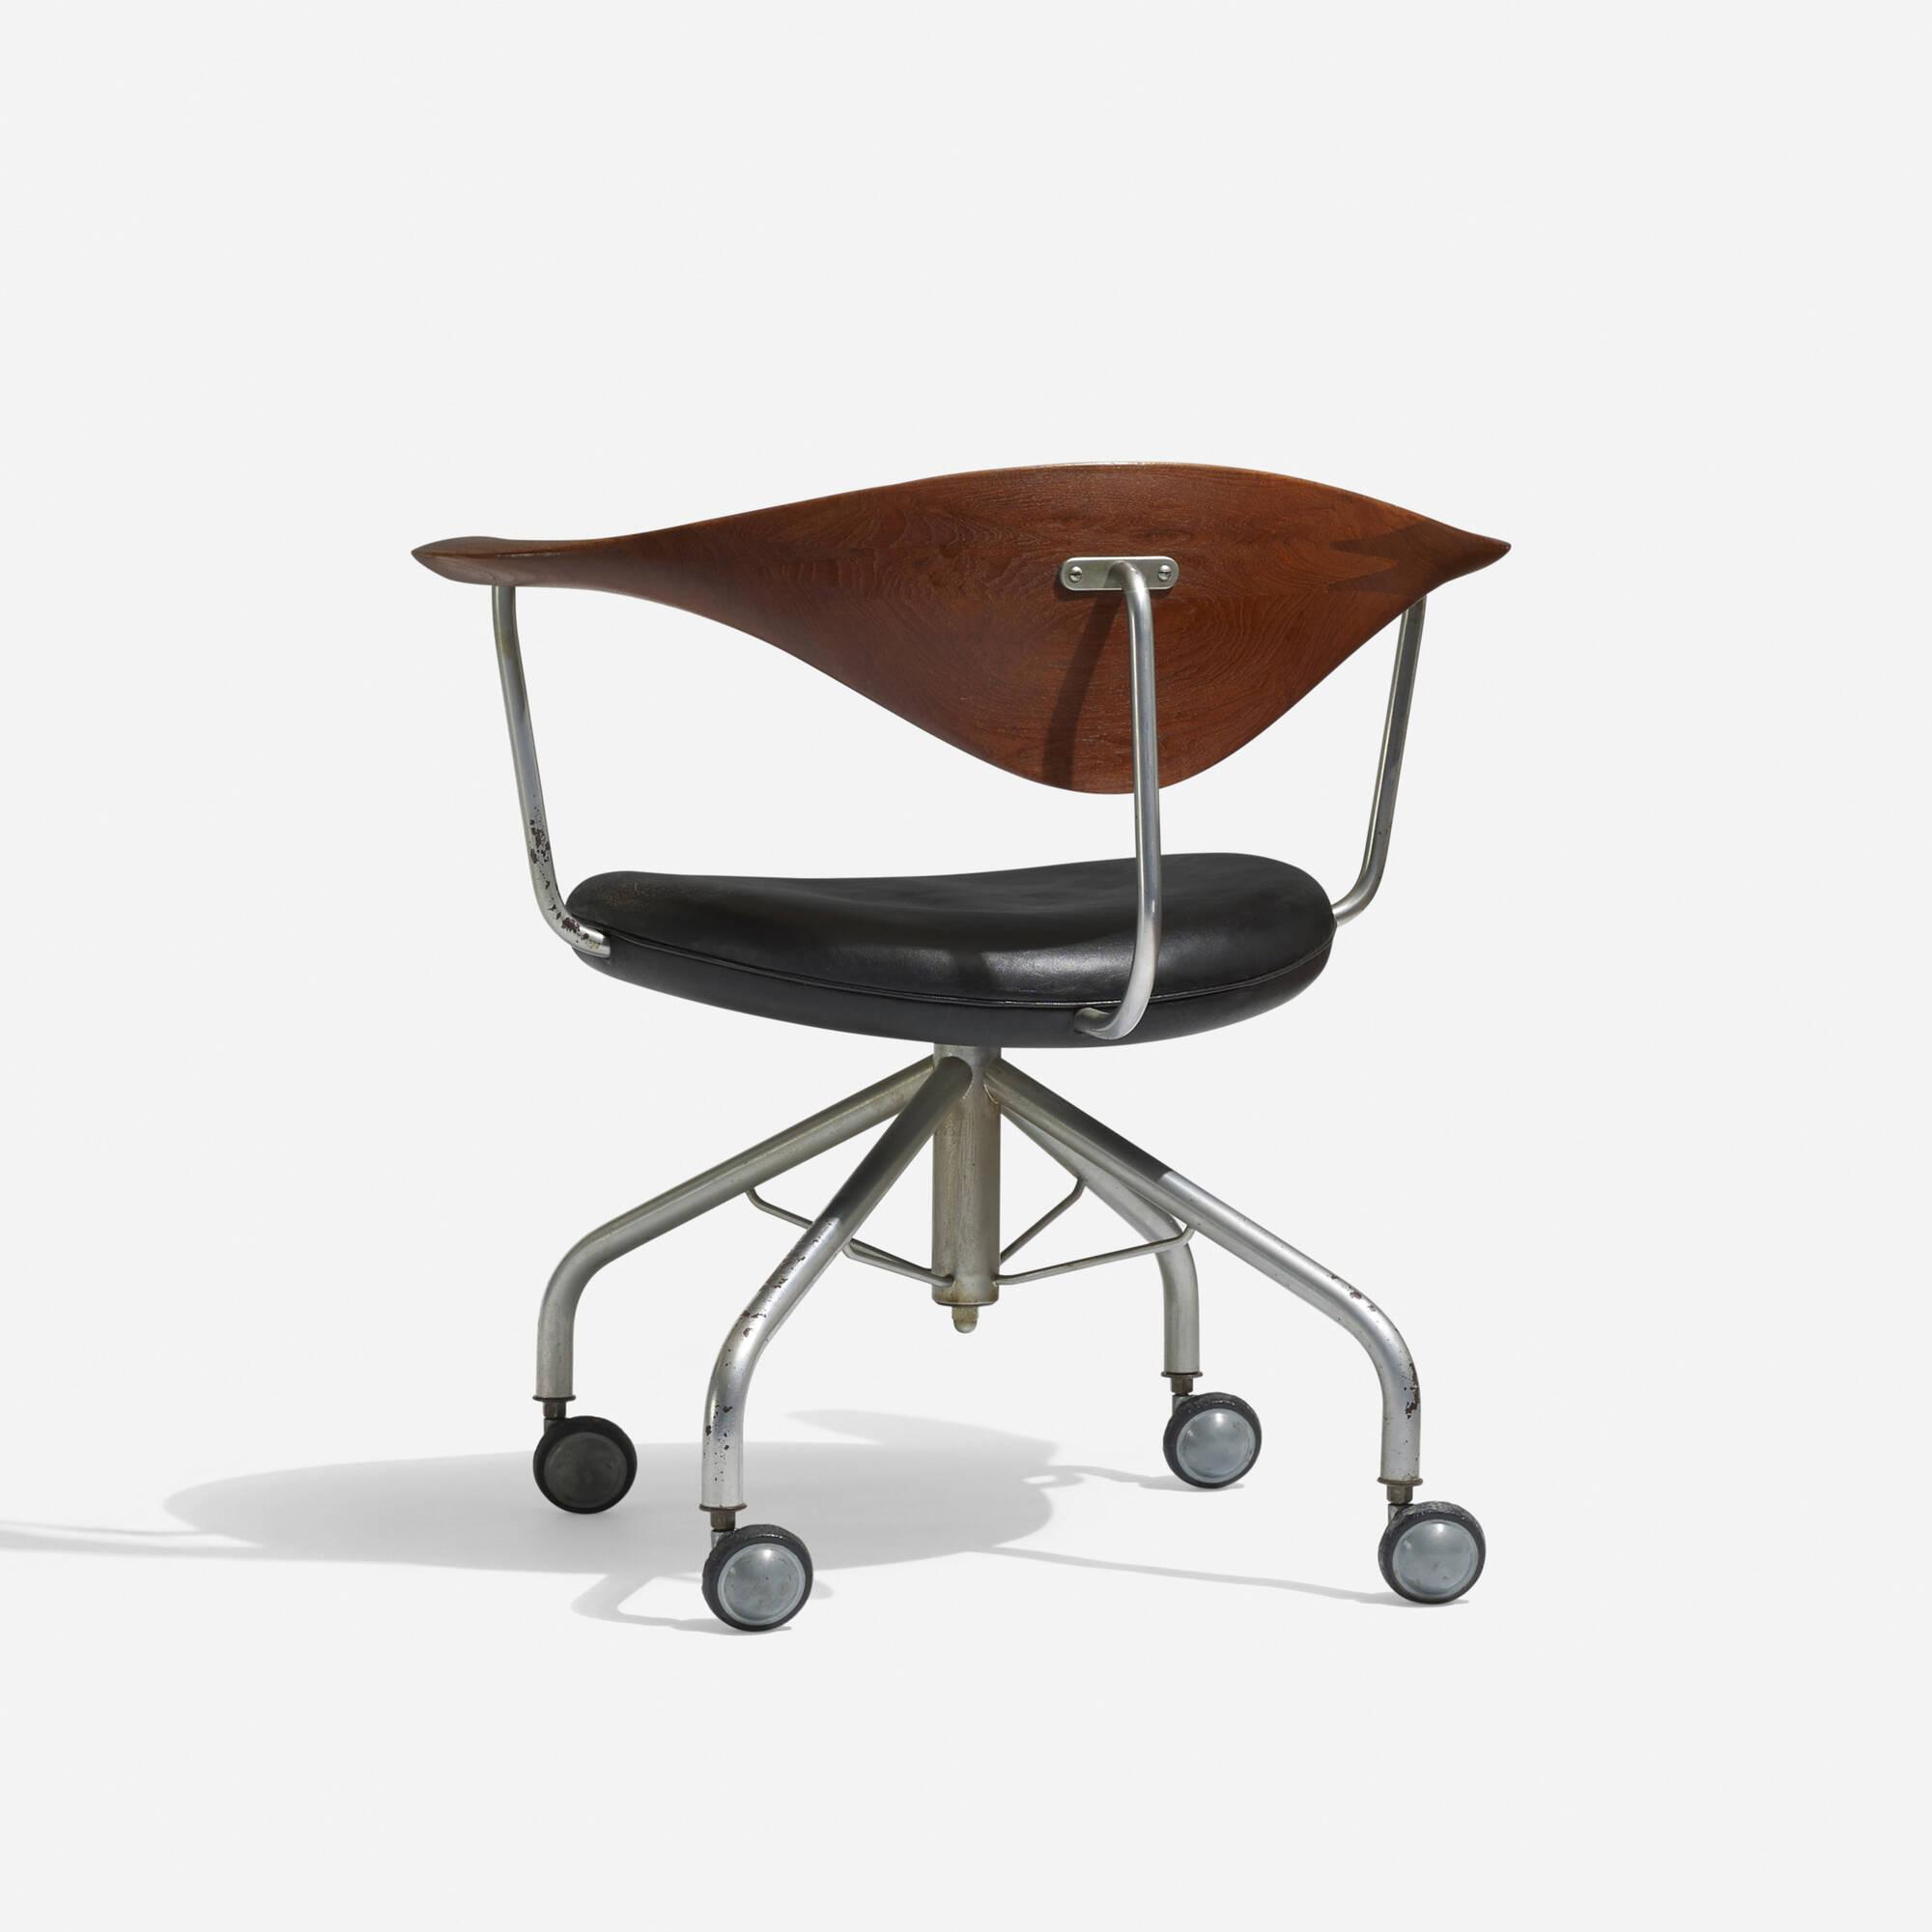 191 Hans J Wegner Swivel Office chair Scandinavian Design 5